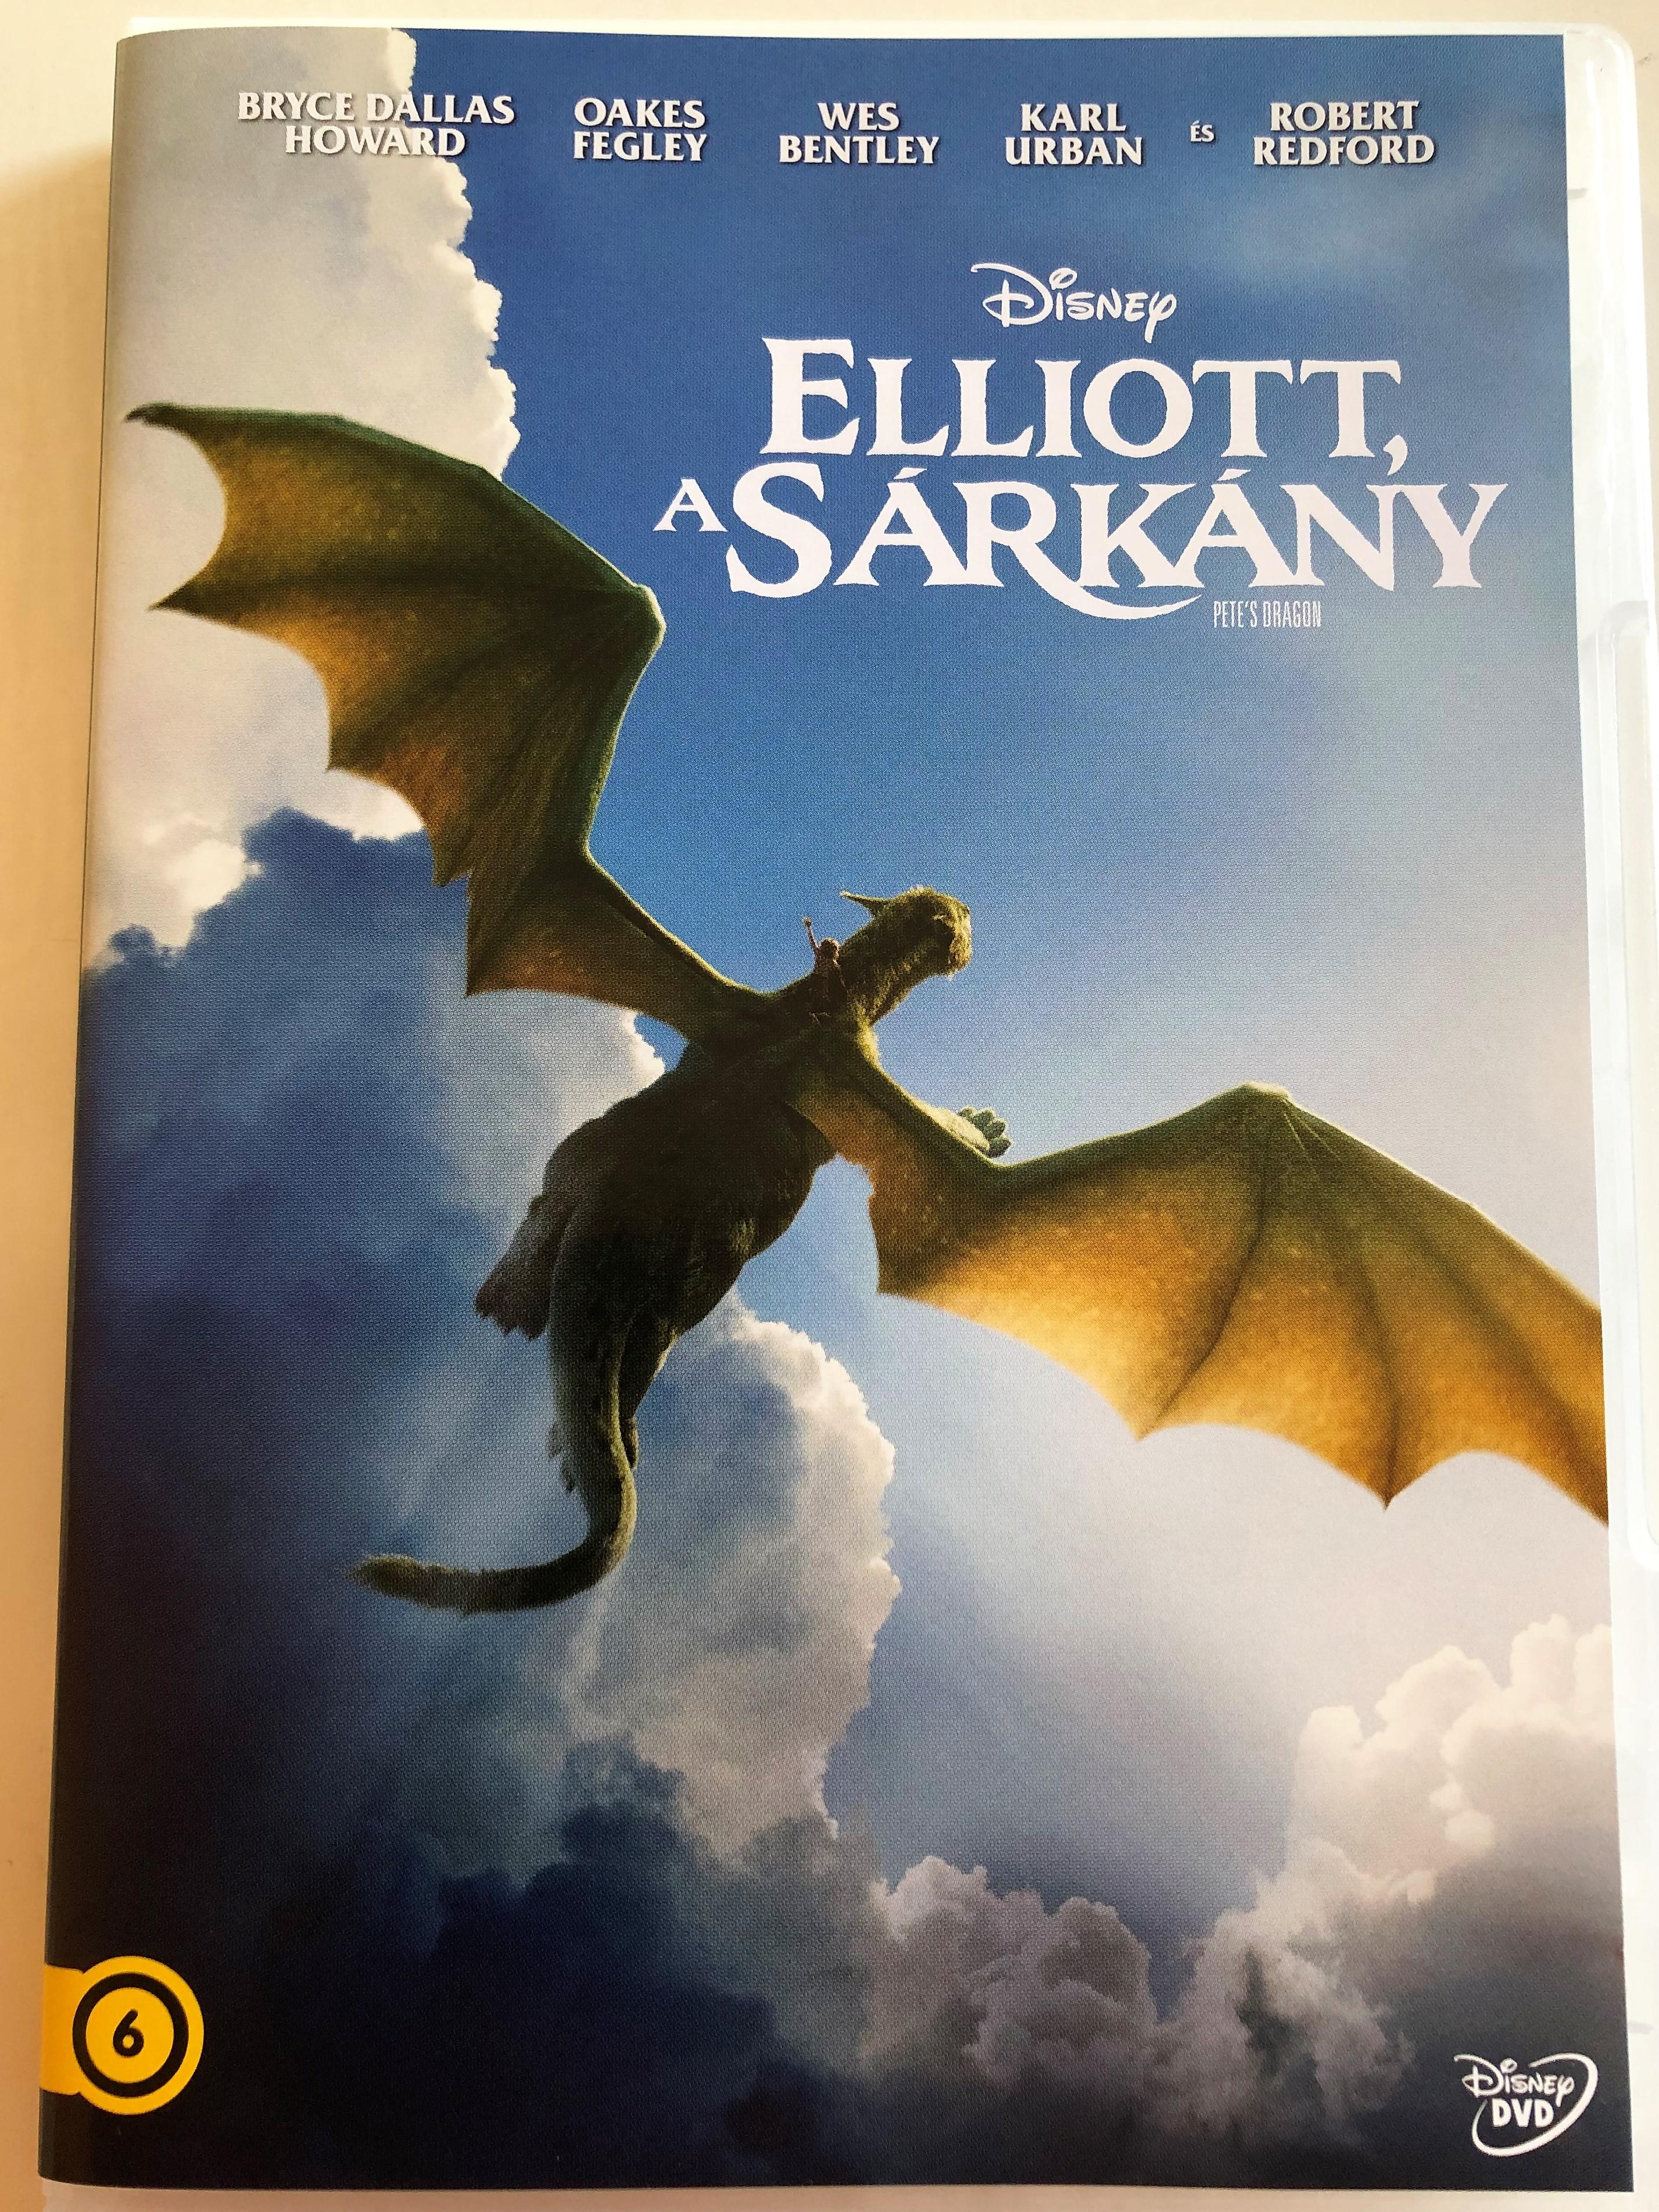 elliott-a-s-rk-ny-dvd-pete-s-dragon-directed-by-david-lowery-starring-bryce-d.-howard-oakes-fegley-wes-bentley-karl-urban-robert-redford-disney-1-.jpg